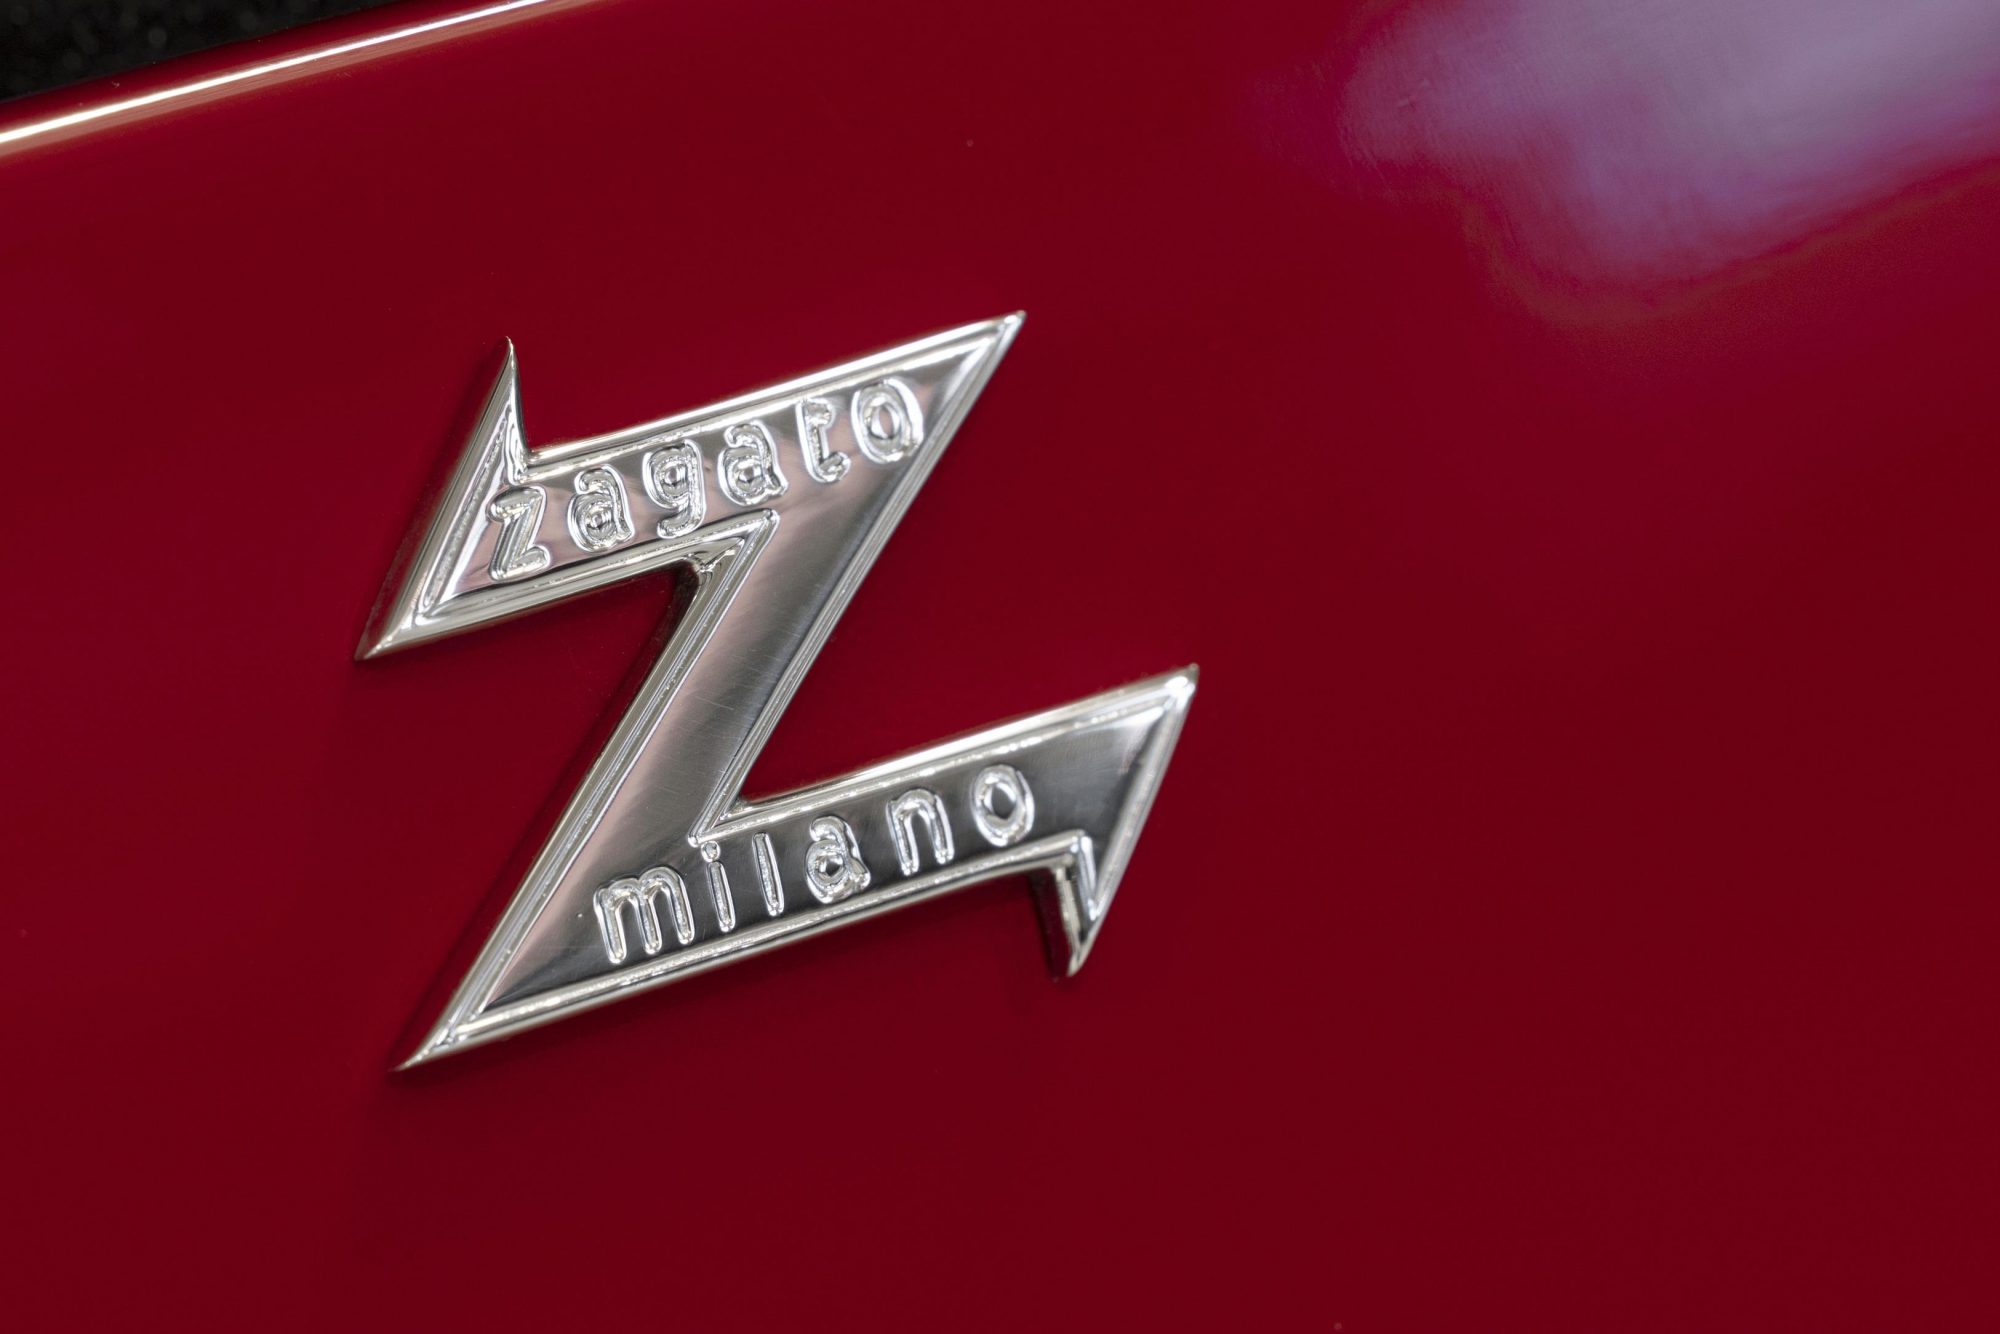 Aston Martin, Aston martin DB4 Zagato, DB4, Zagato, Zagato Continuation, Zagato emblem